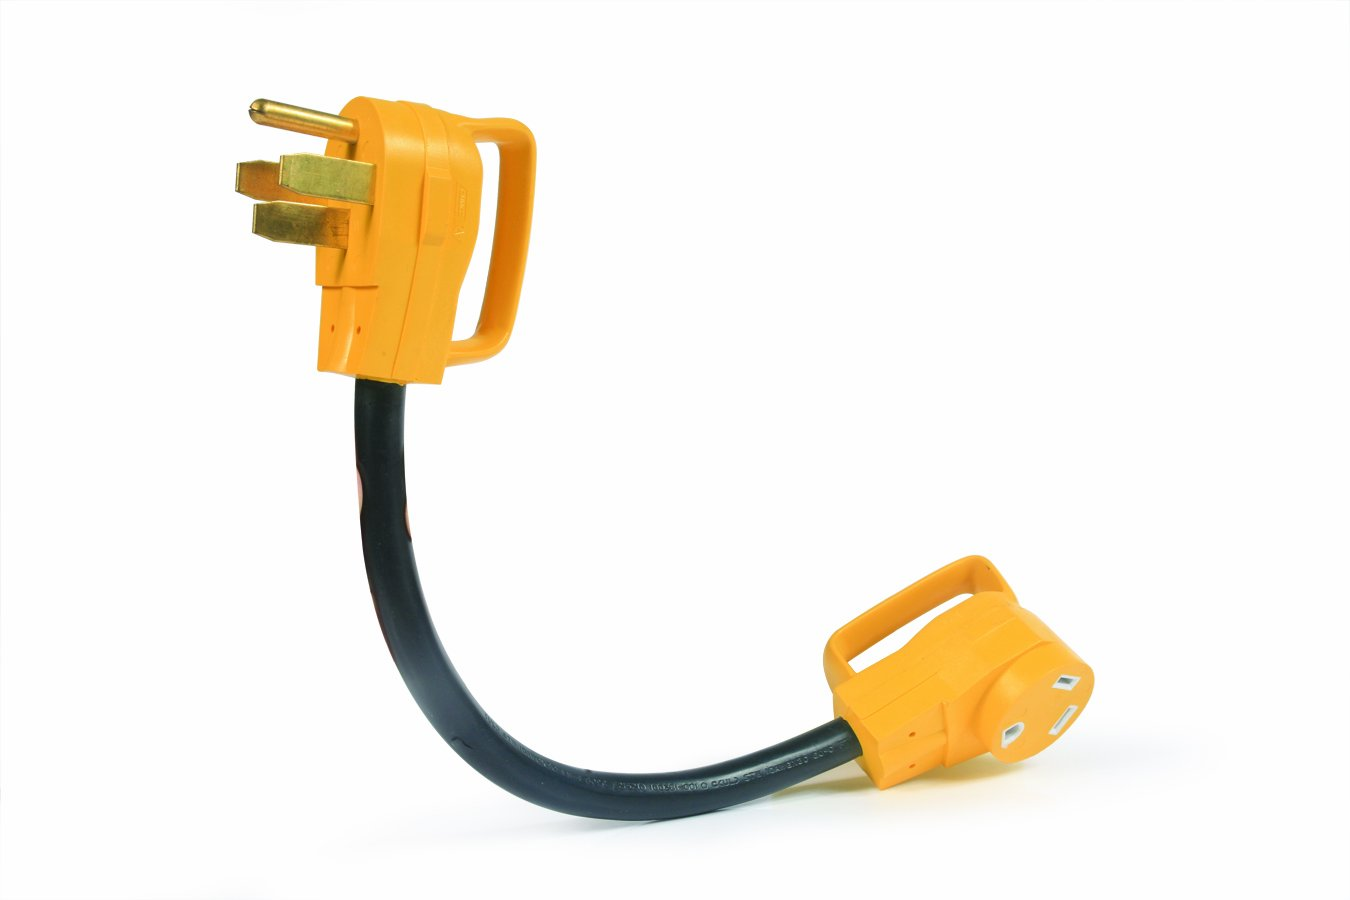 Wiring 50 Amp Plug For Rv